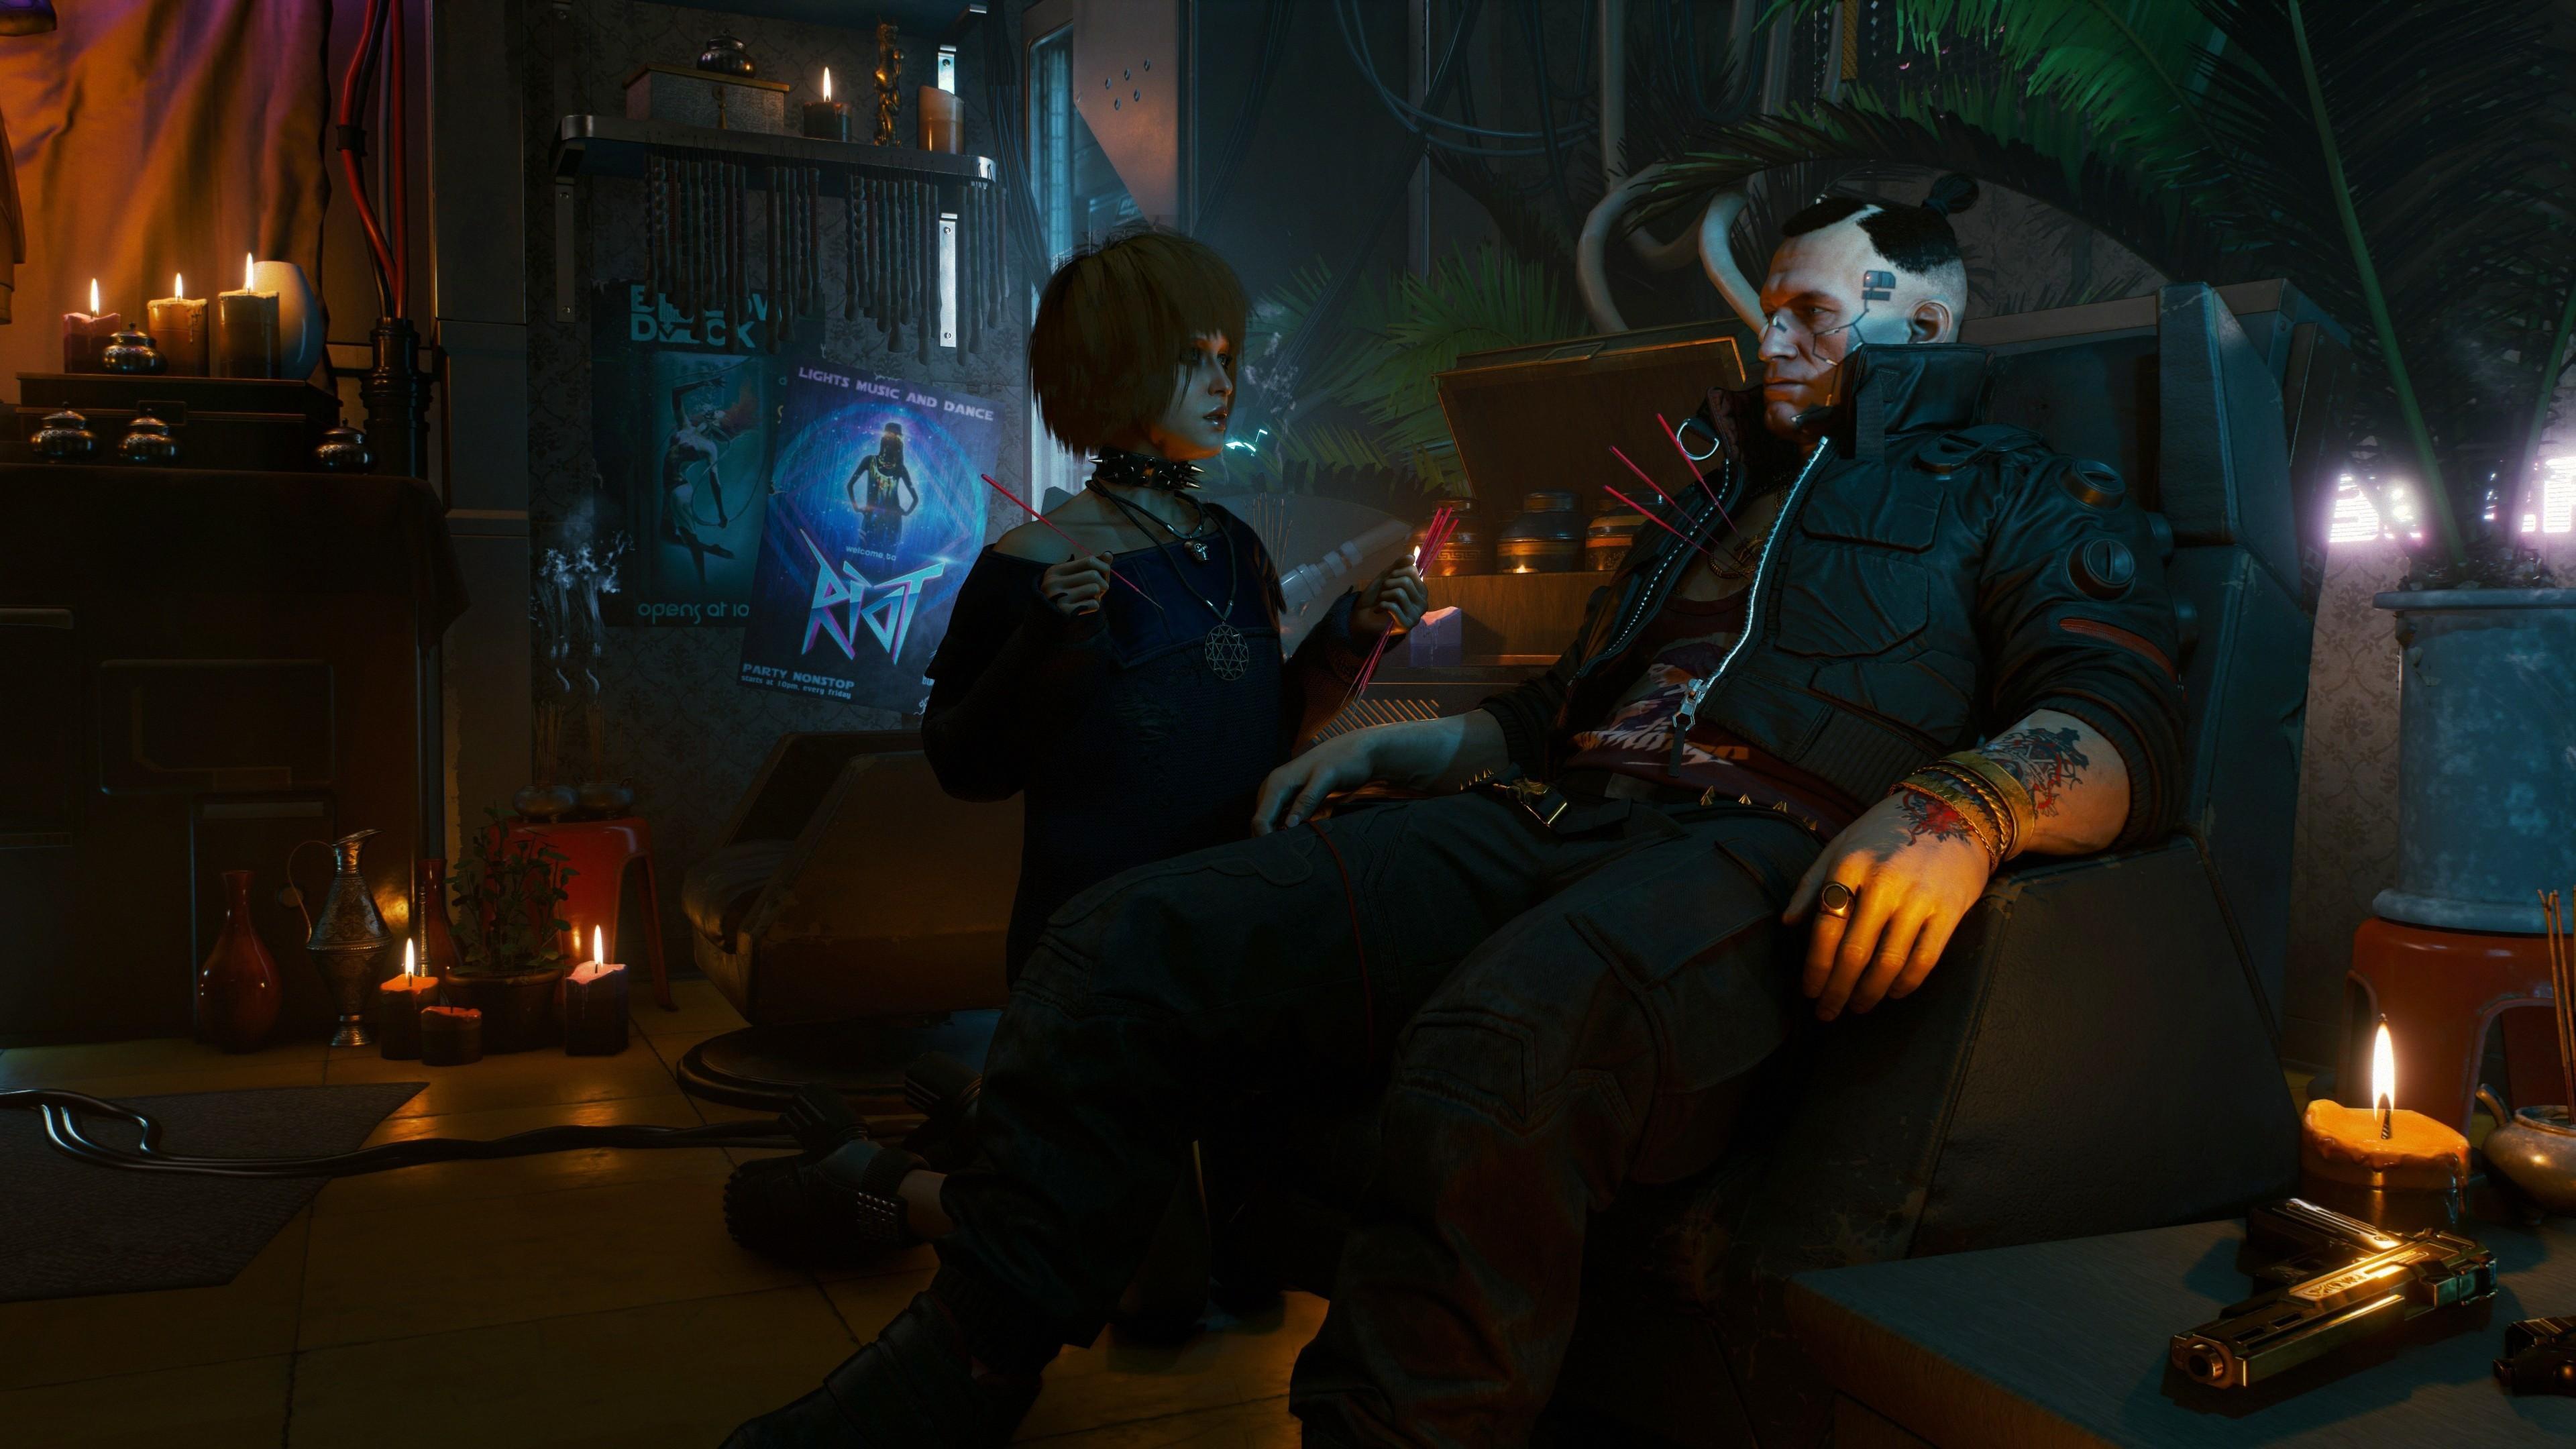 Презентации Cyberpunk 2077 выделят целый час на E3 2019